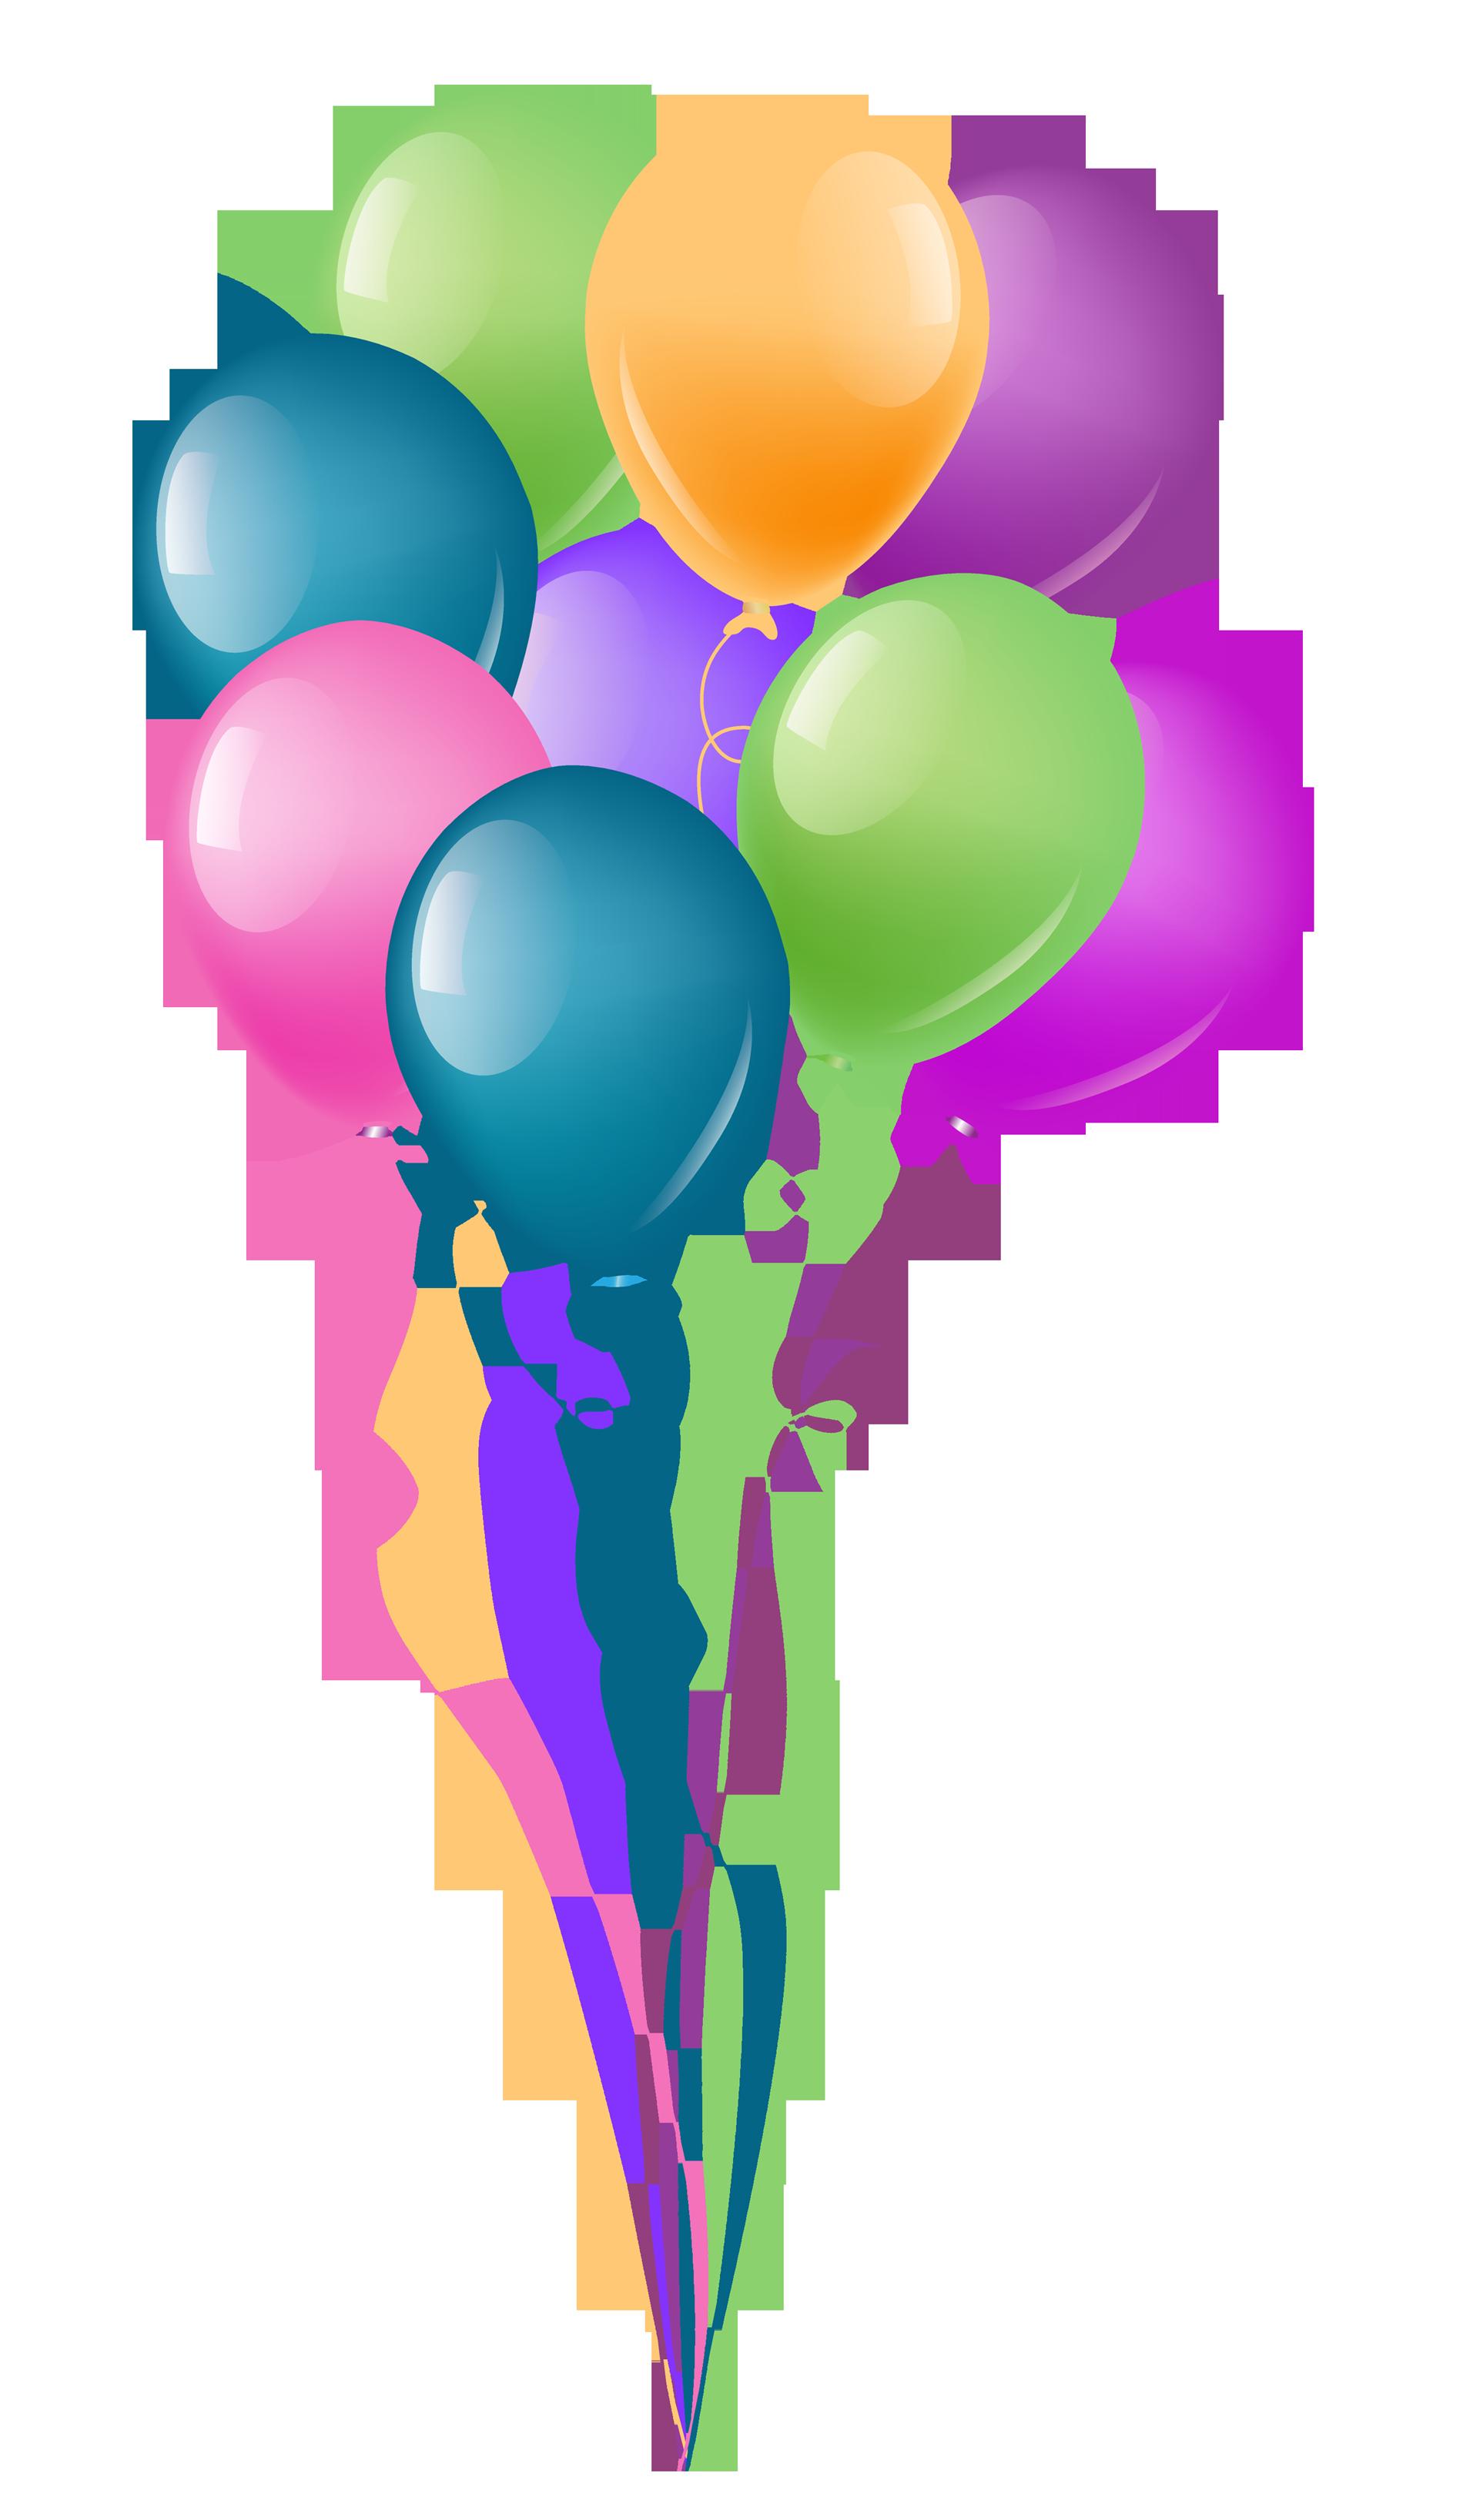 Balloon HD PNG - 91257